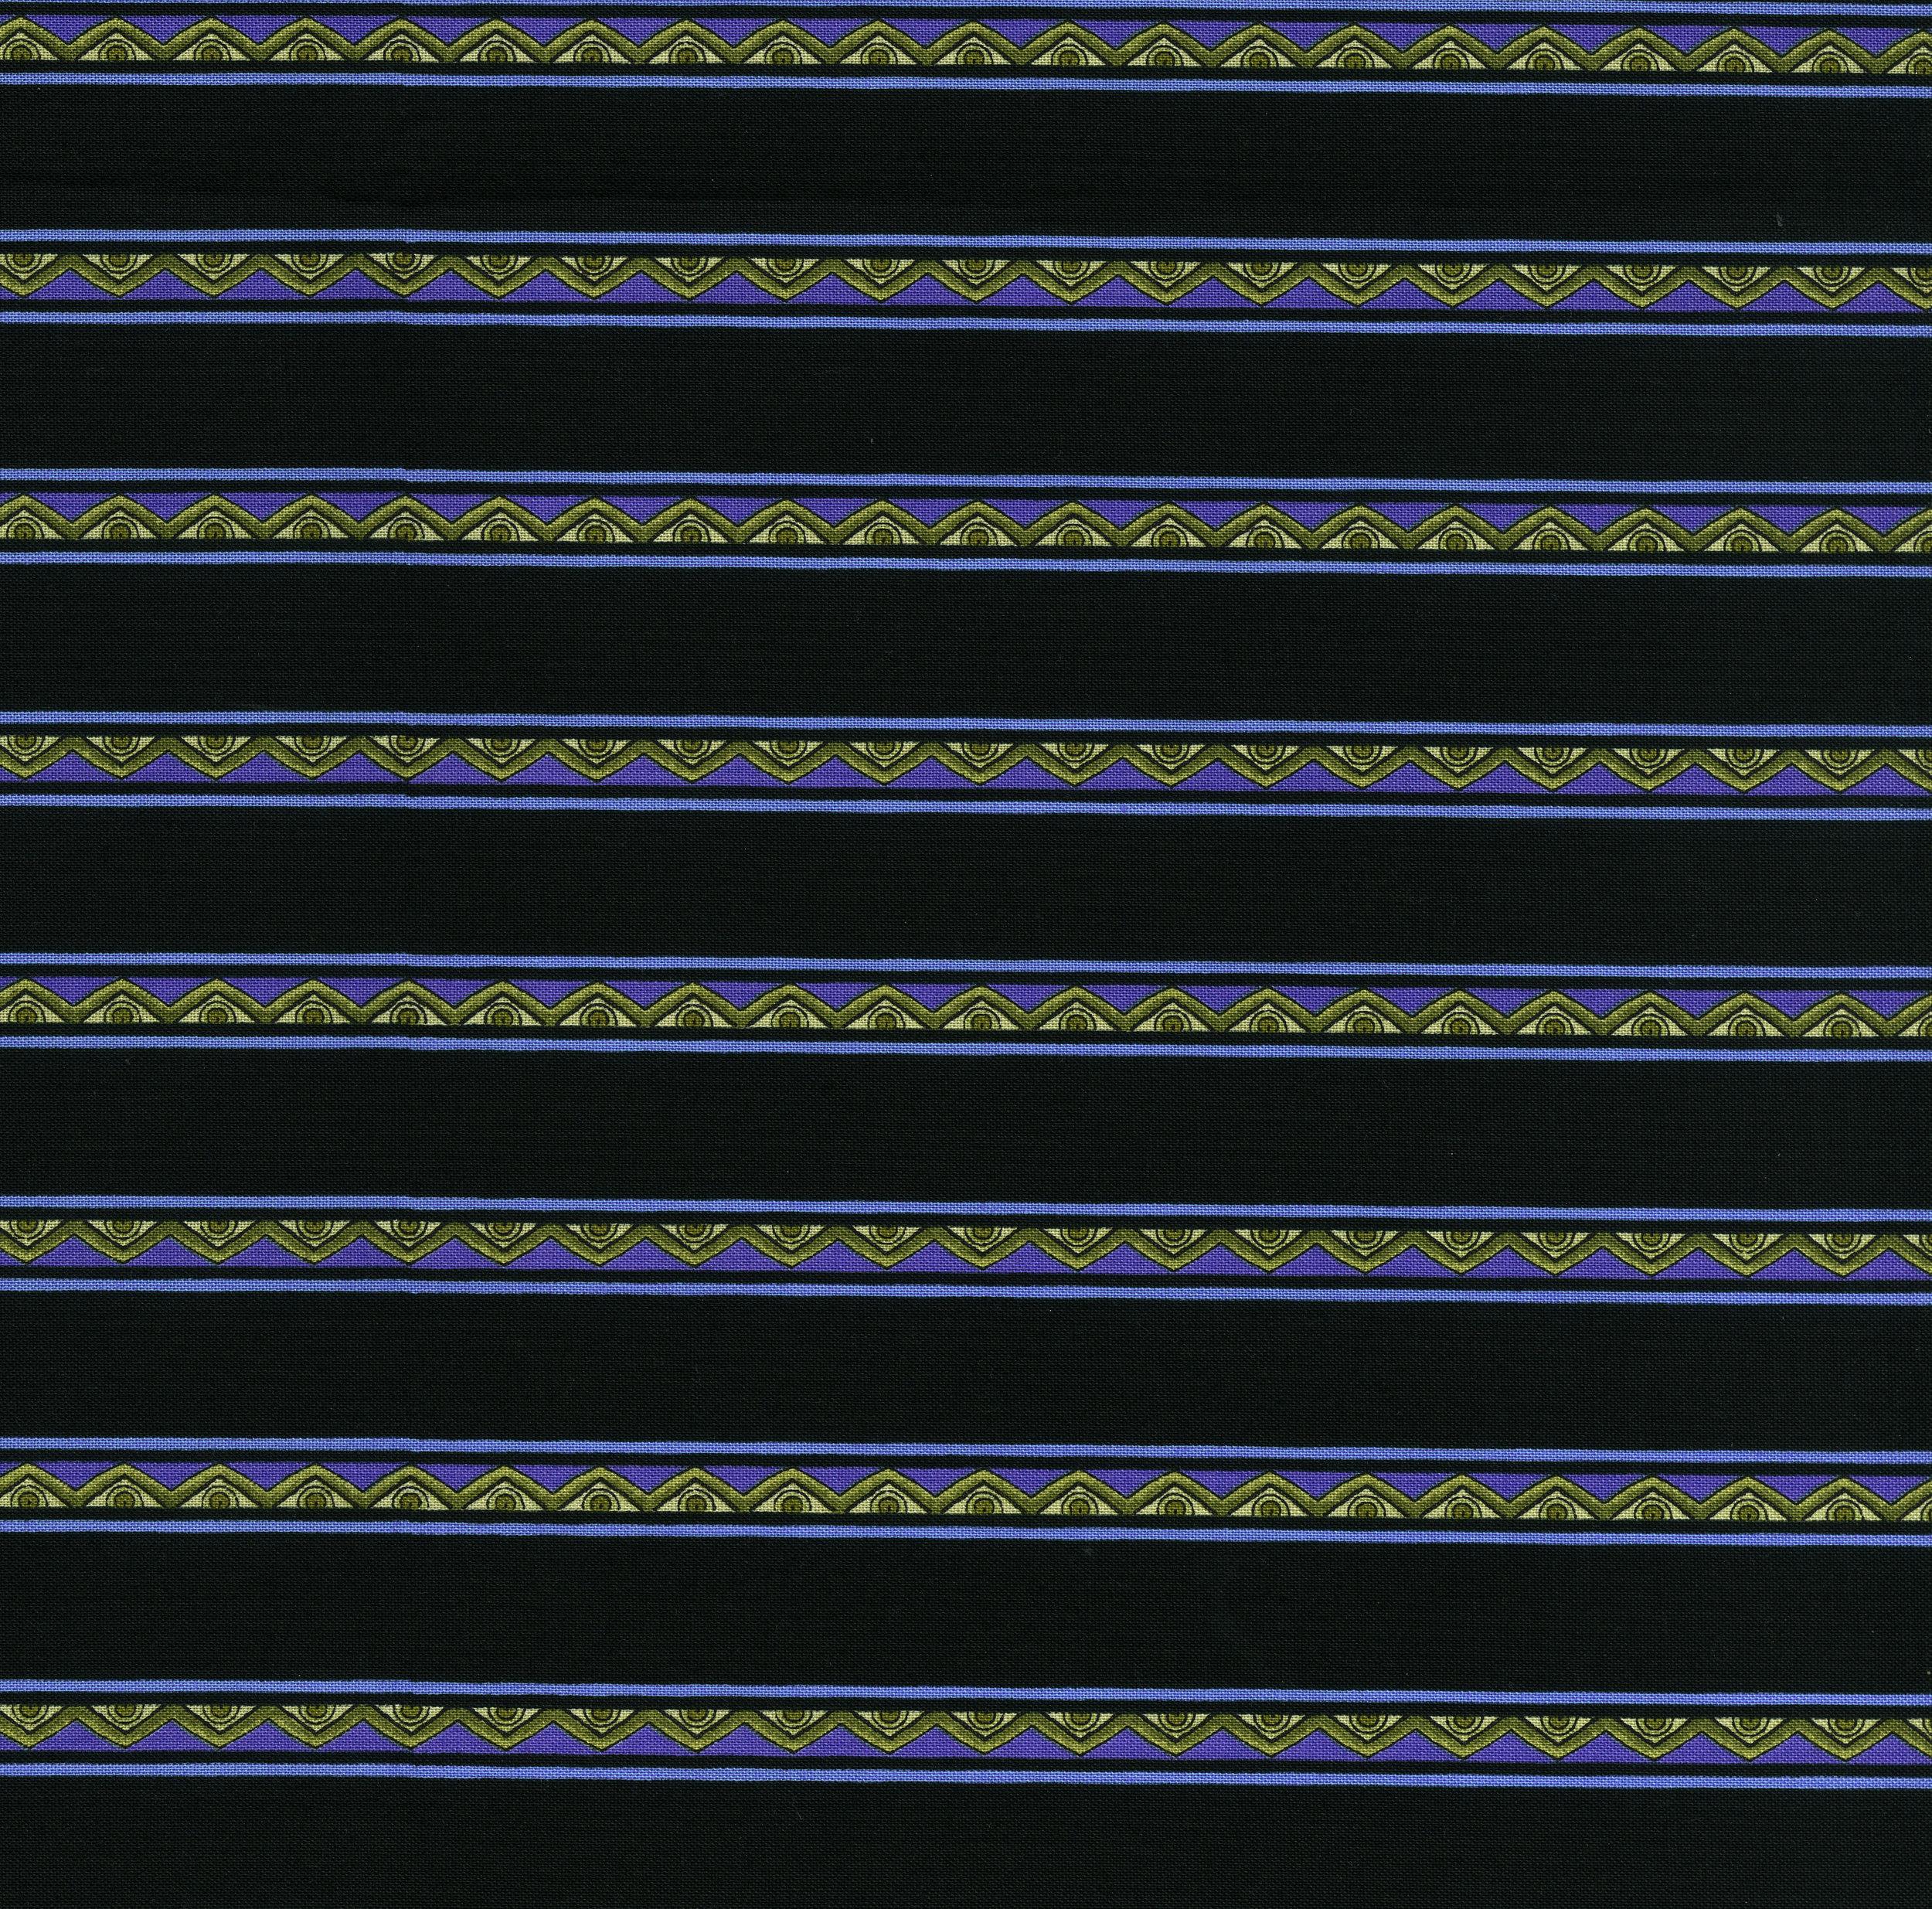 3287-005 MINI STRIPE-INDIGO